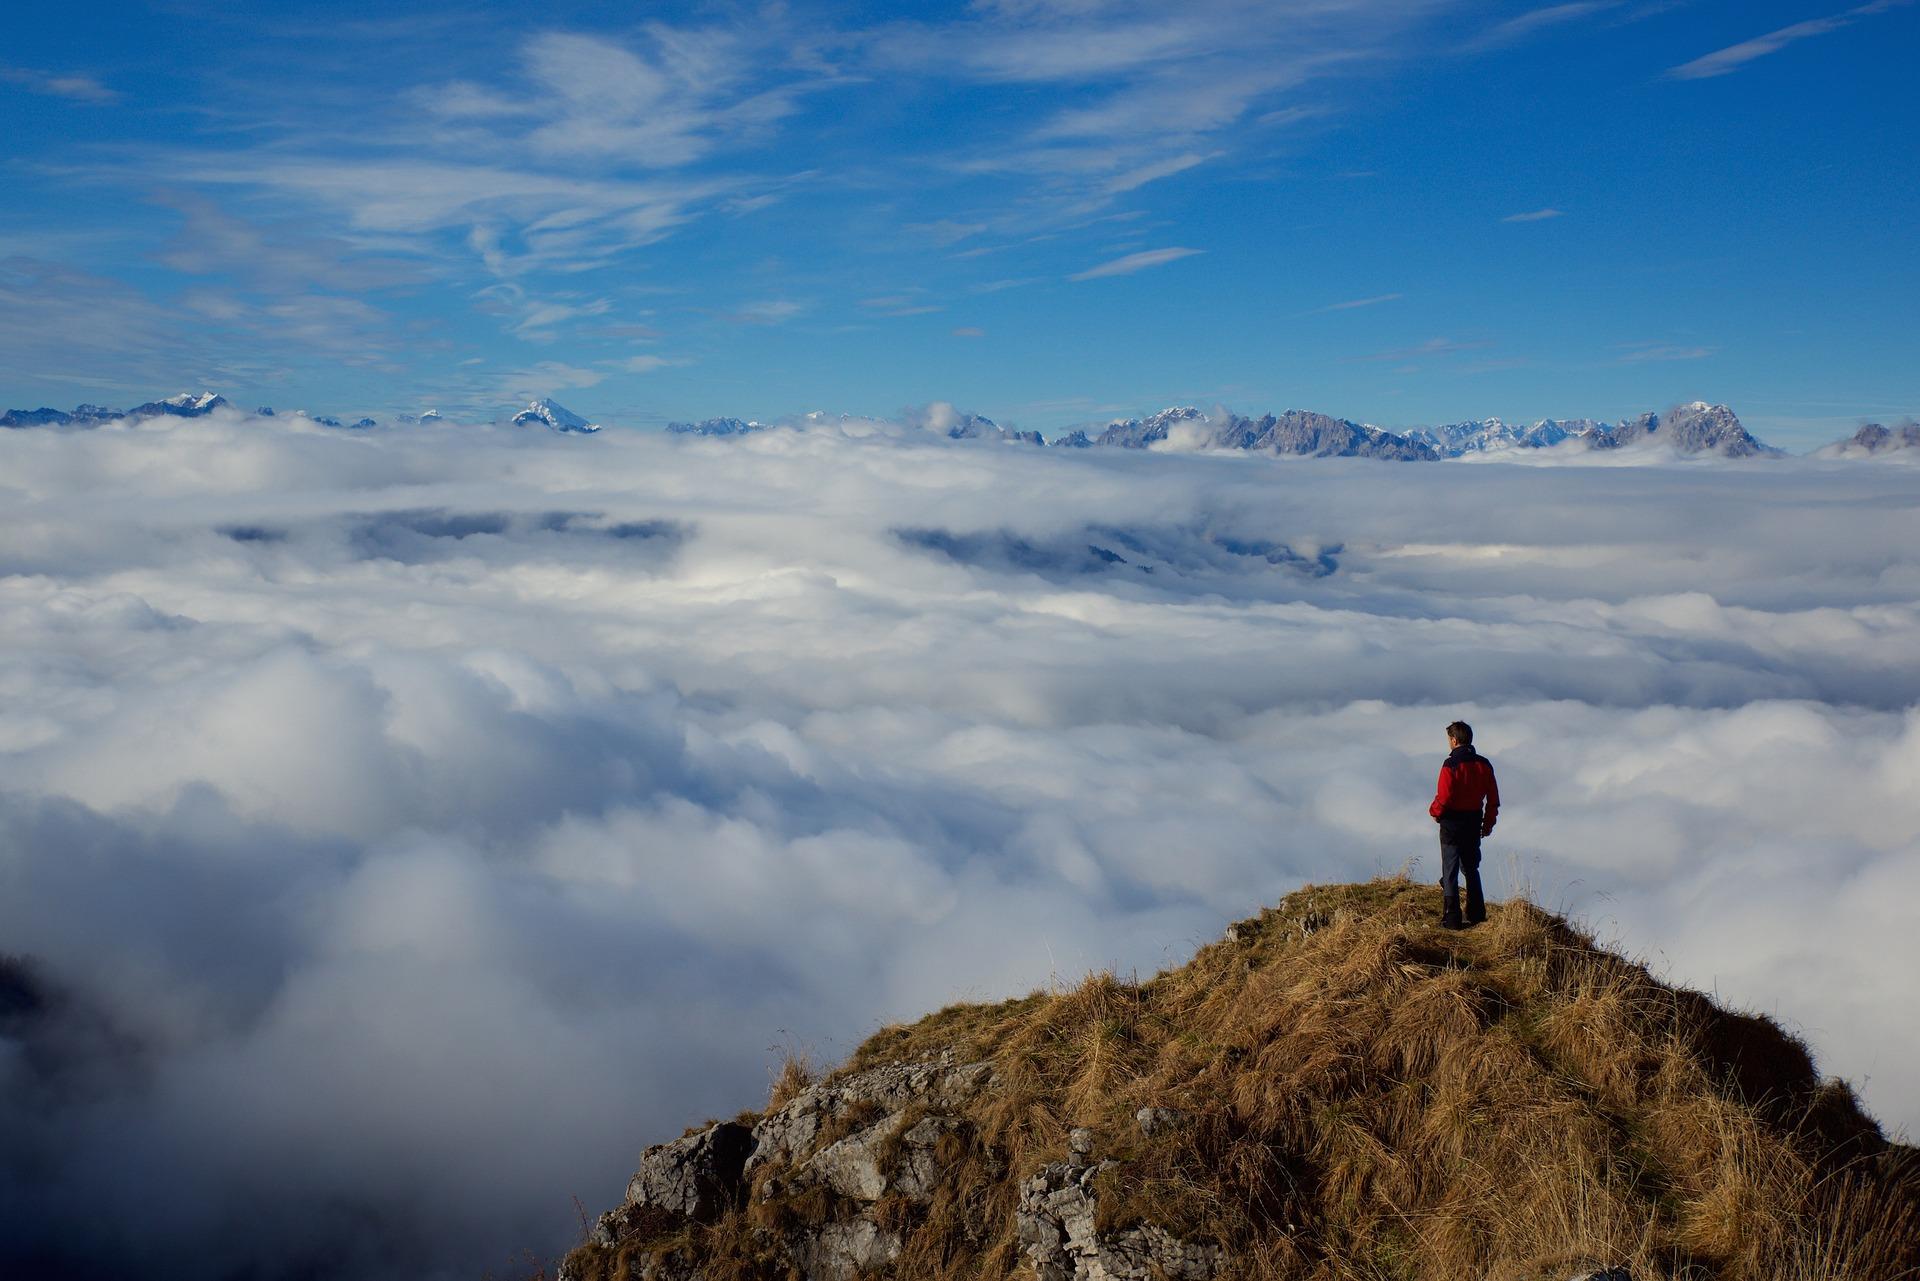 La nube a otro nivel